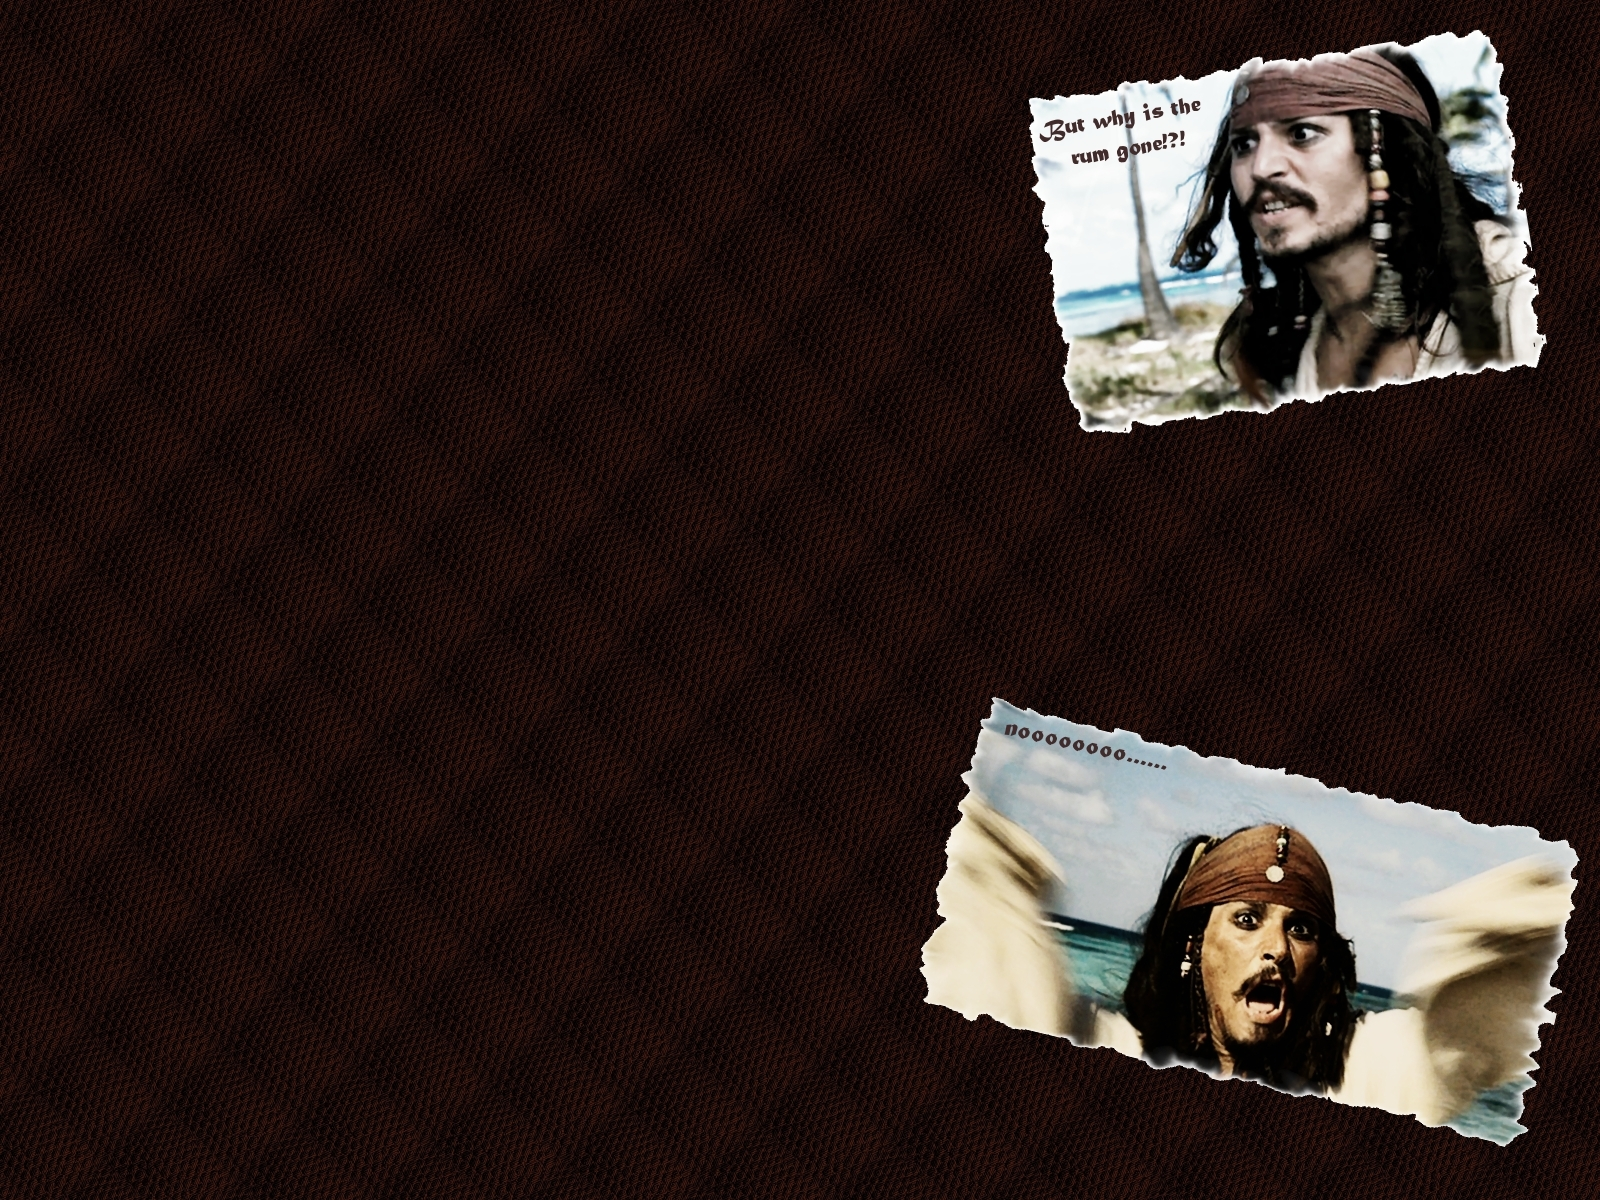 http://3.bp.blogspot.com/_e08tXXFmPM8/TShsxKx_aHI/AAAAAAAAAbA/OWZrIe9_79Q/s1600/Jack-Sparrow-pirates-of-the-caribbean-7793708-1600-1200.jpg